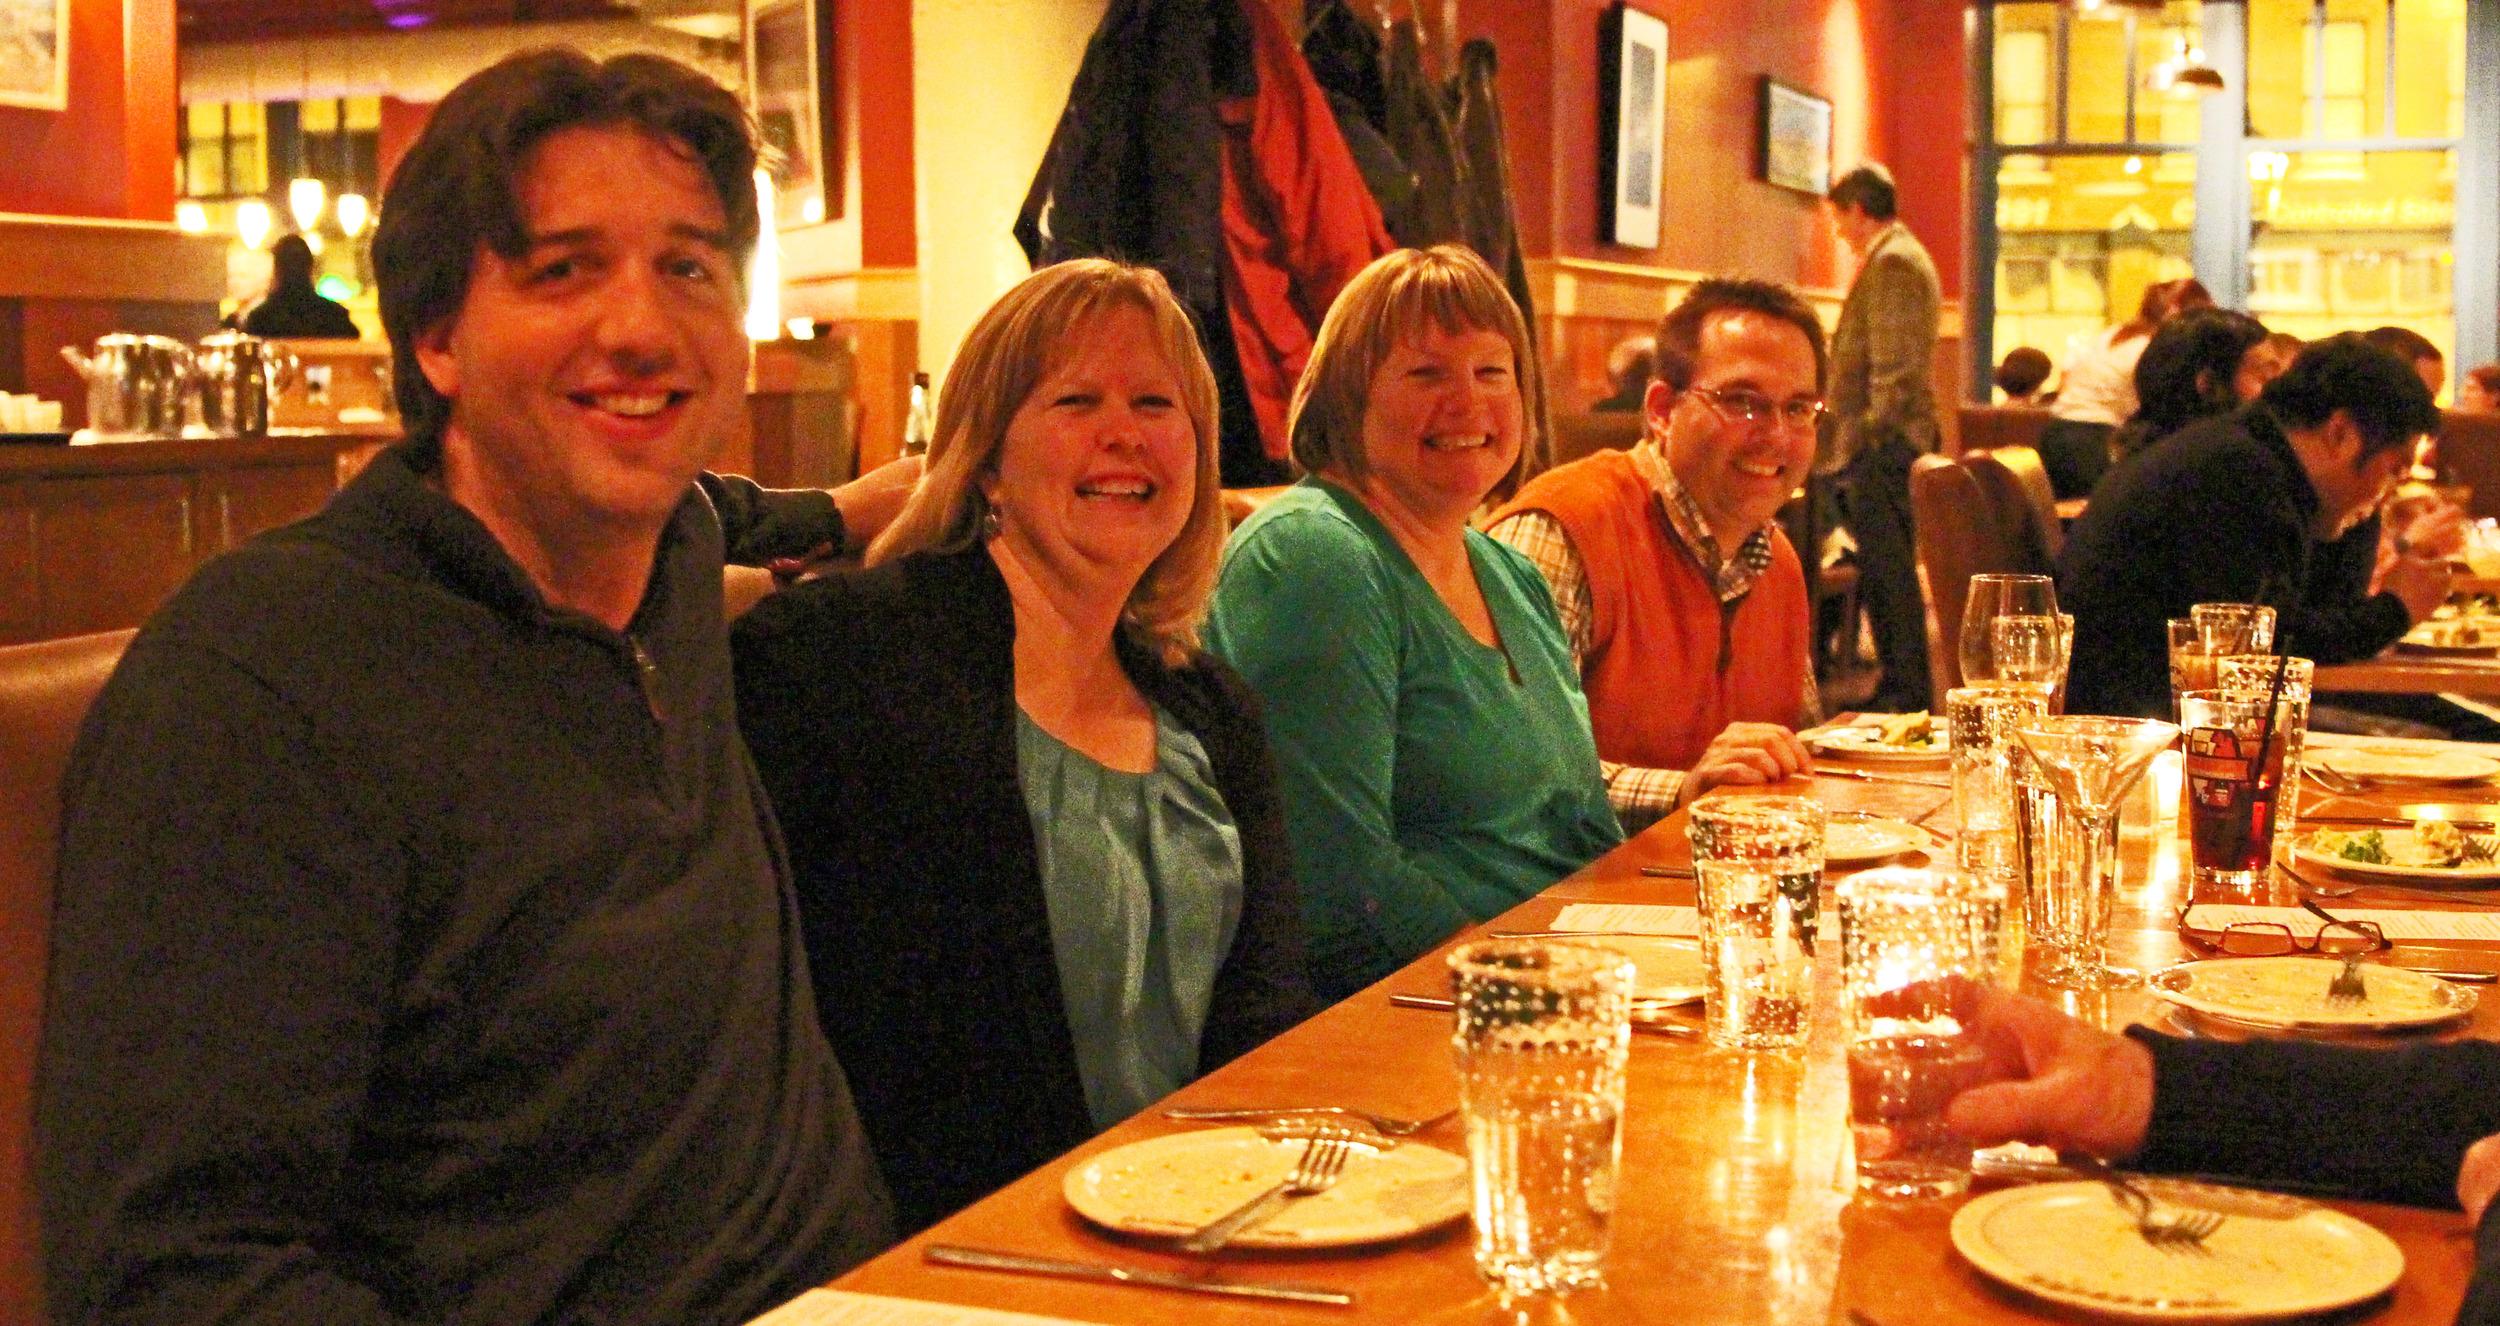 fun table regulars and friends.jpg